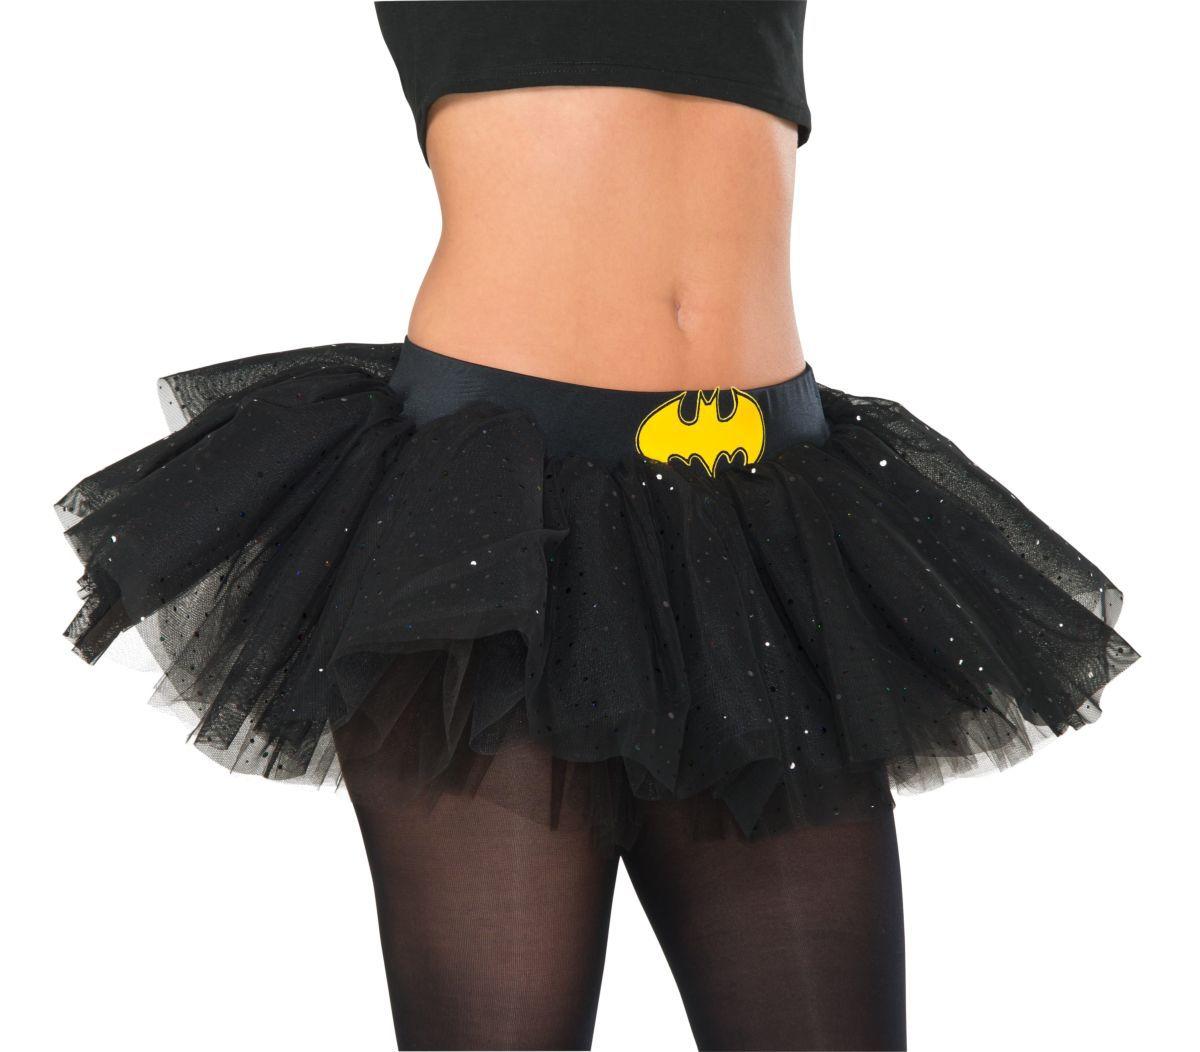 Saia Com Tutu Batgirl: Batman (Acessório Fantasia) - Rubies Costume - CD